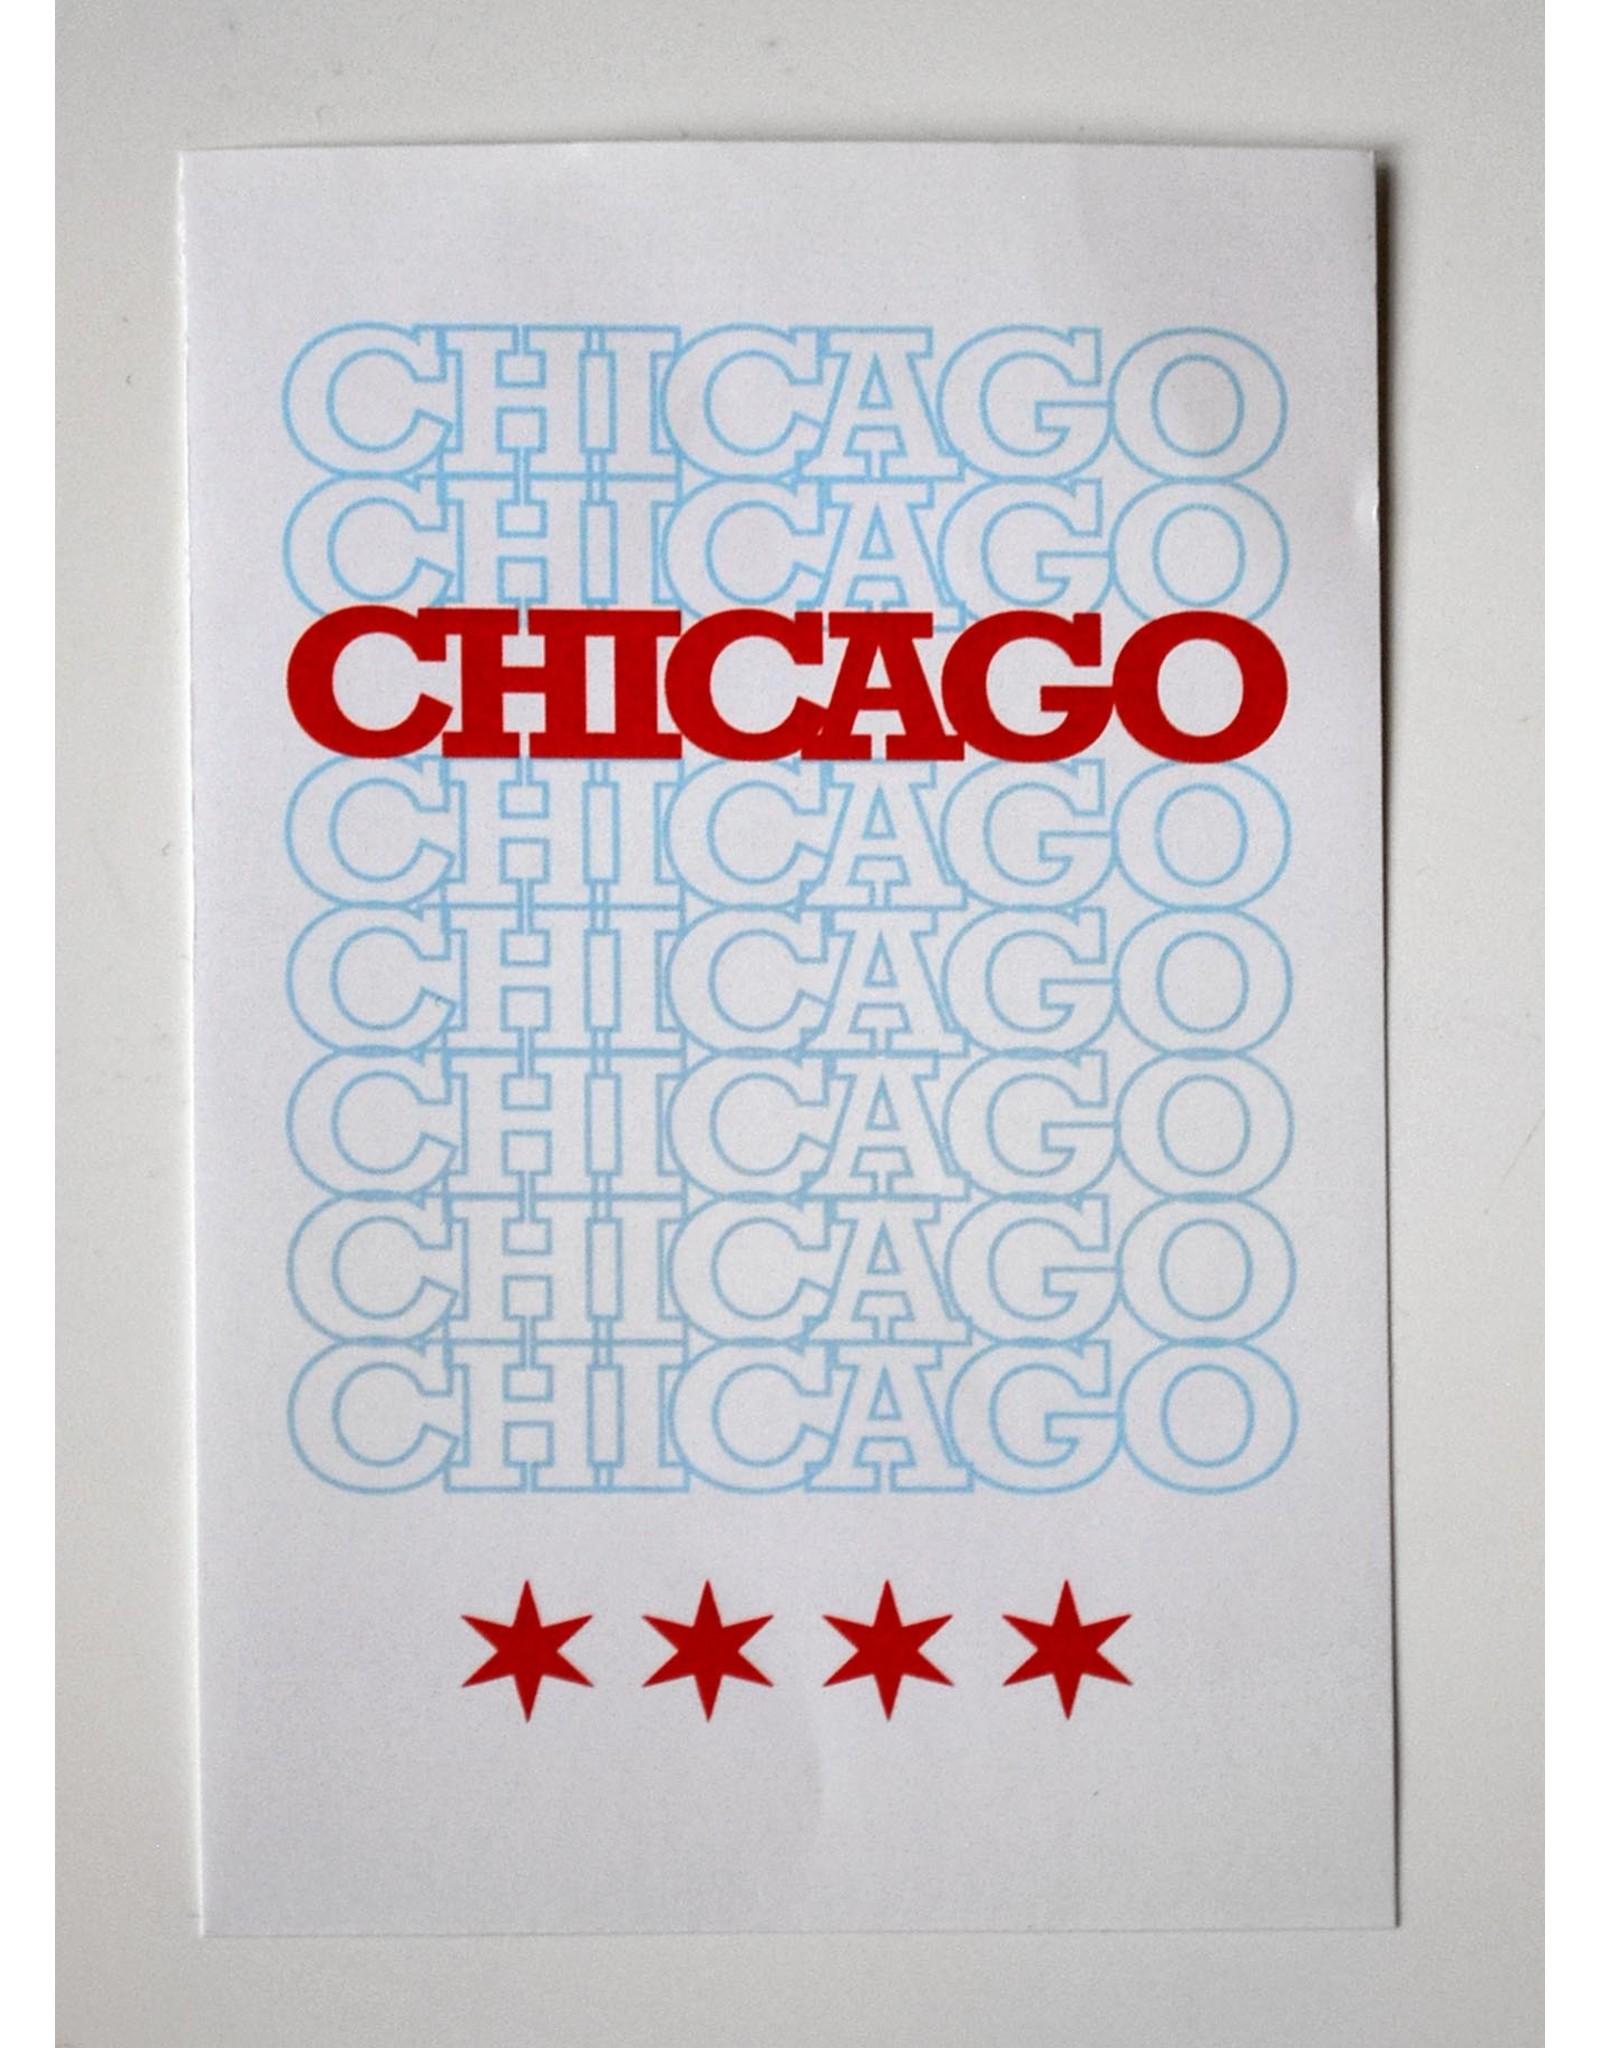 Knight Illustrations Corvus Press: Chicago Original Recyclable Sticker by David Knight